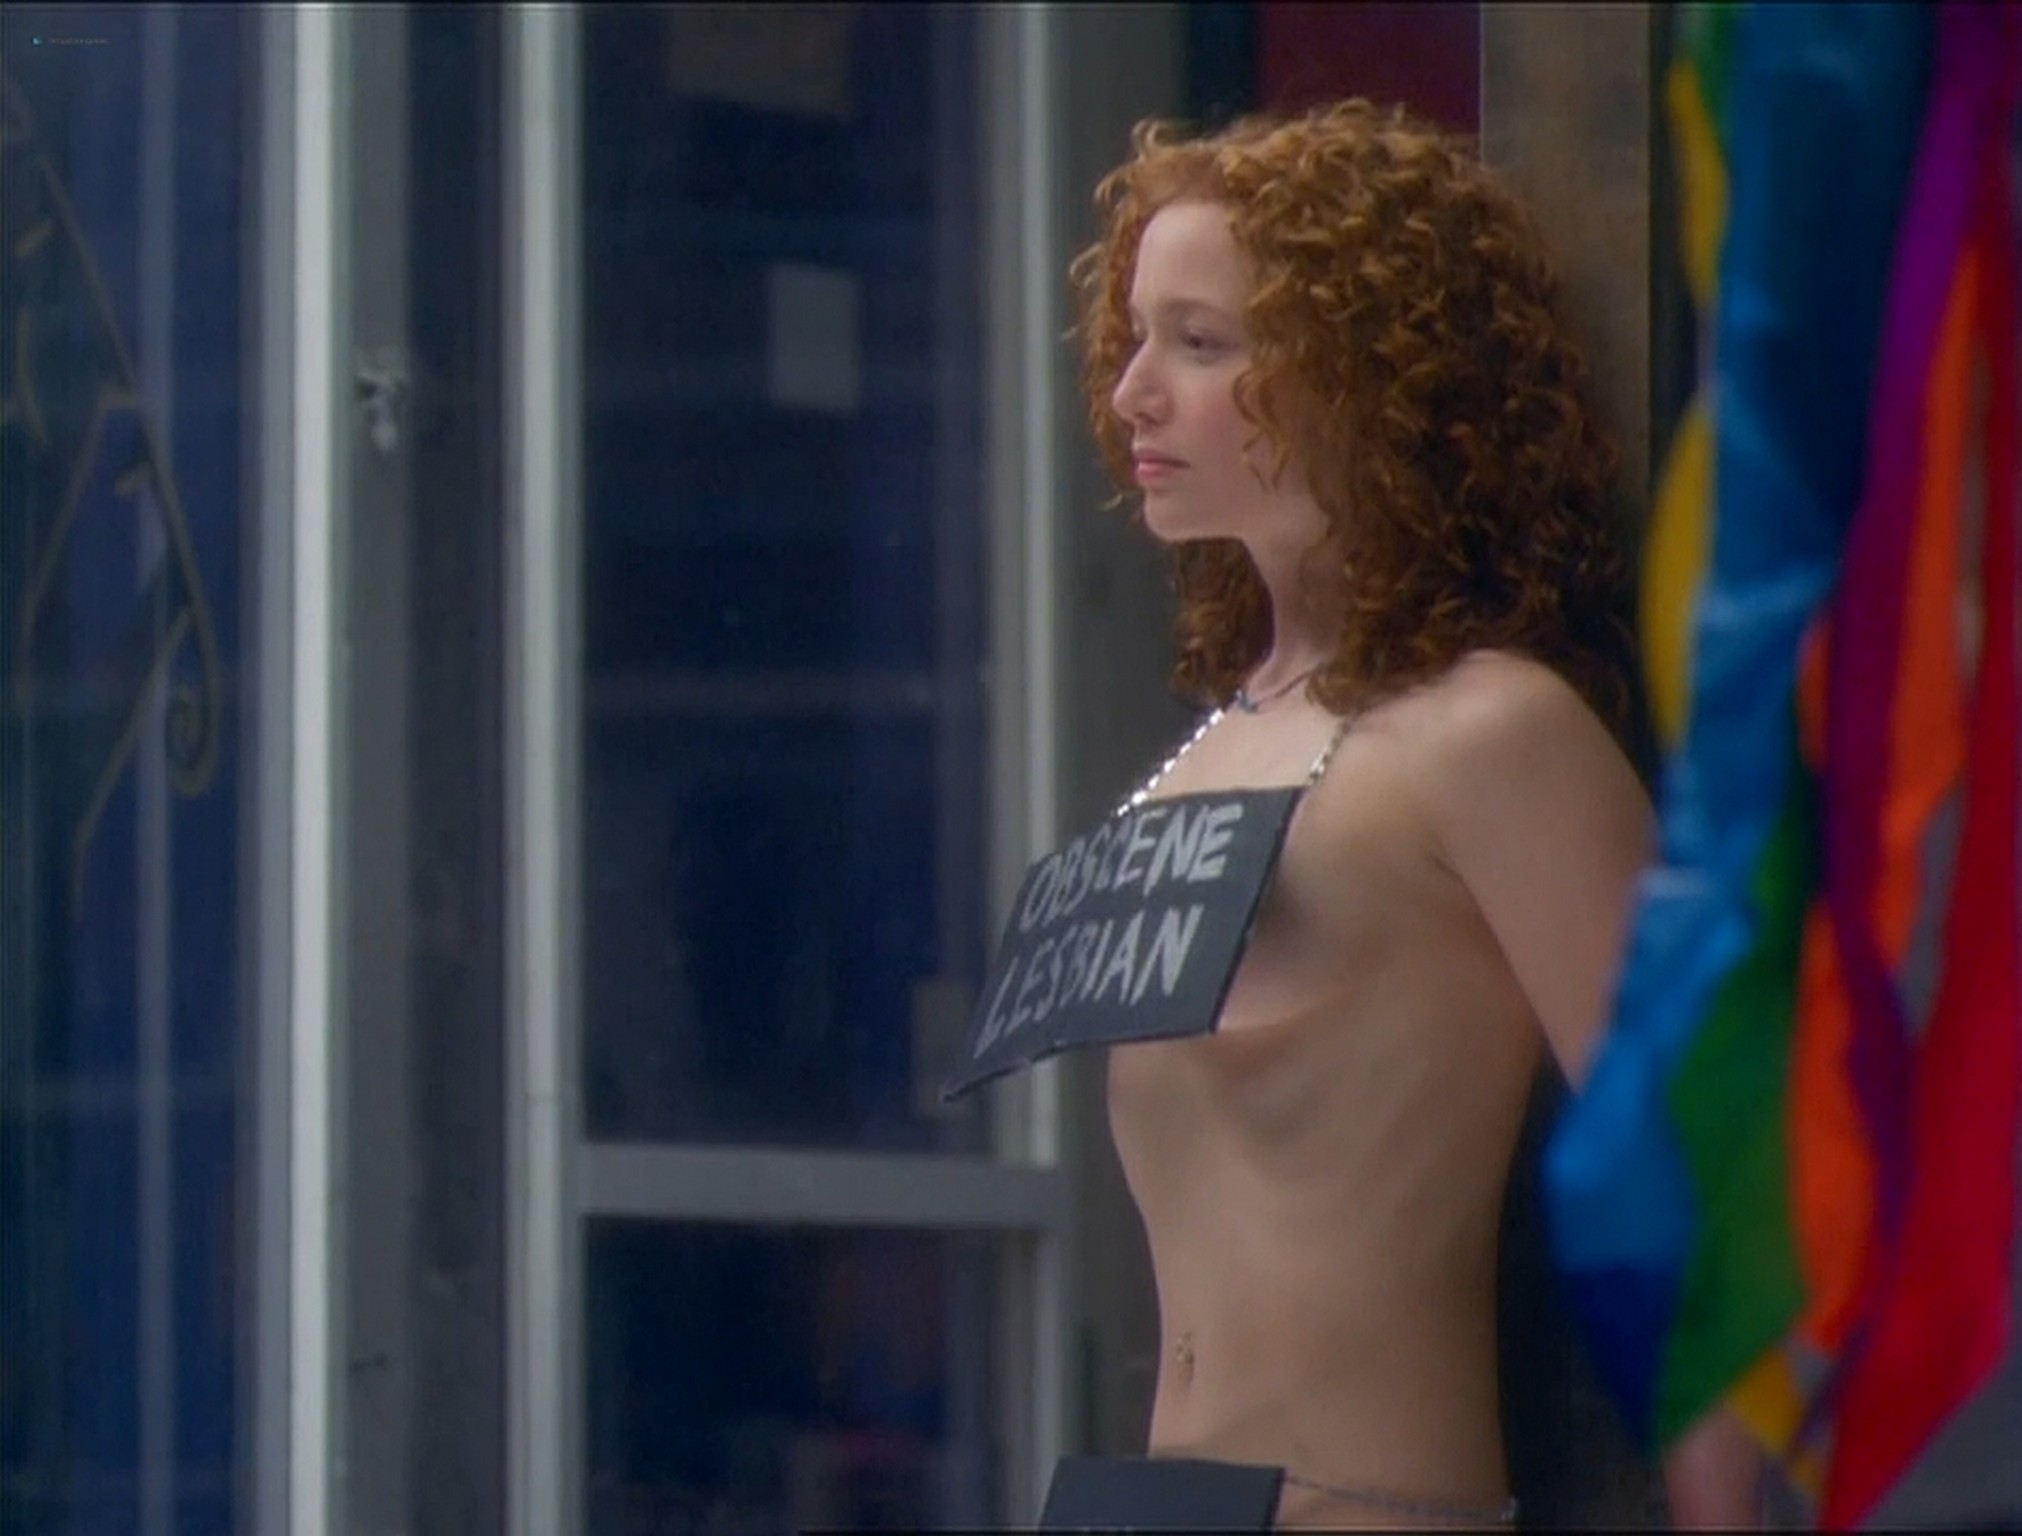 Christina Cox nude bush lesbian sex with Karyn Dwyer nude too Better than Chocolate 1999 HD 720p WEB DL 14